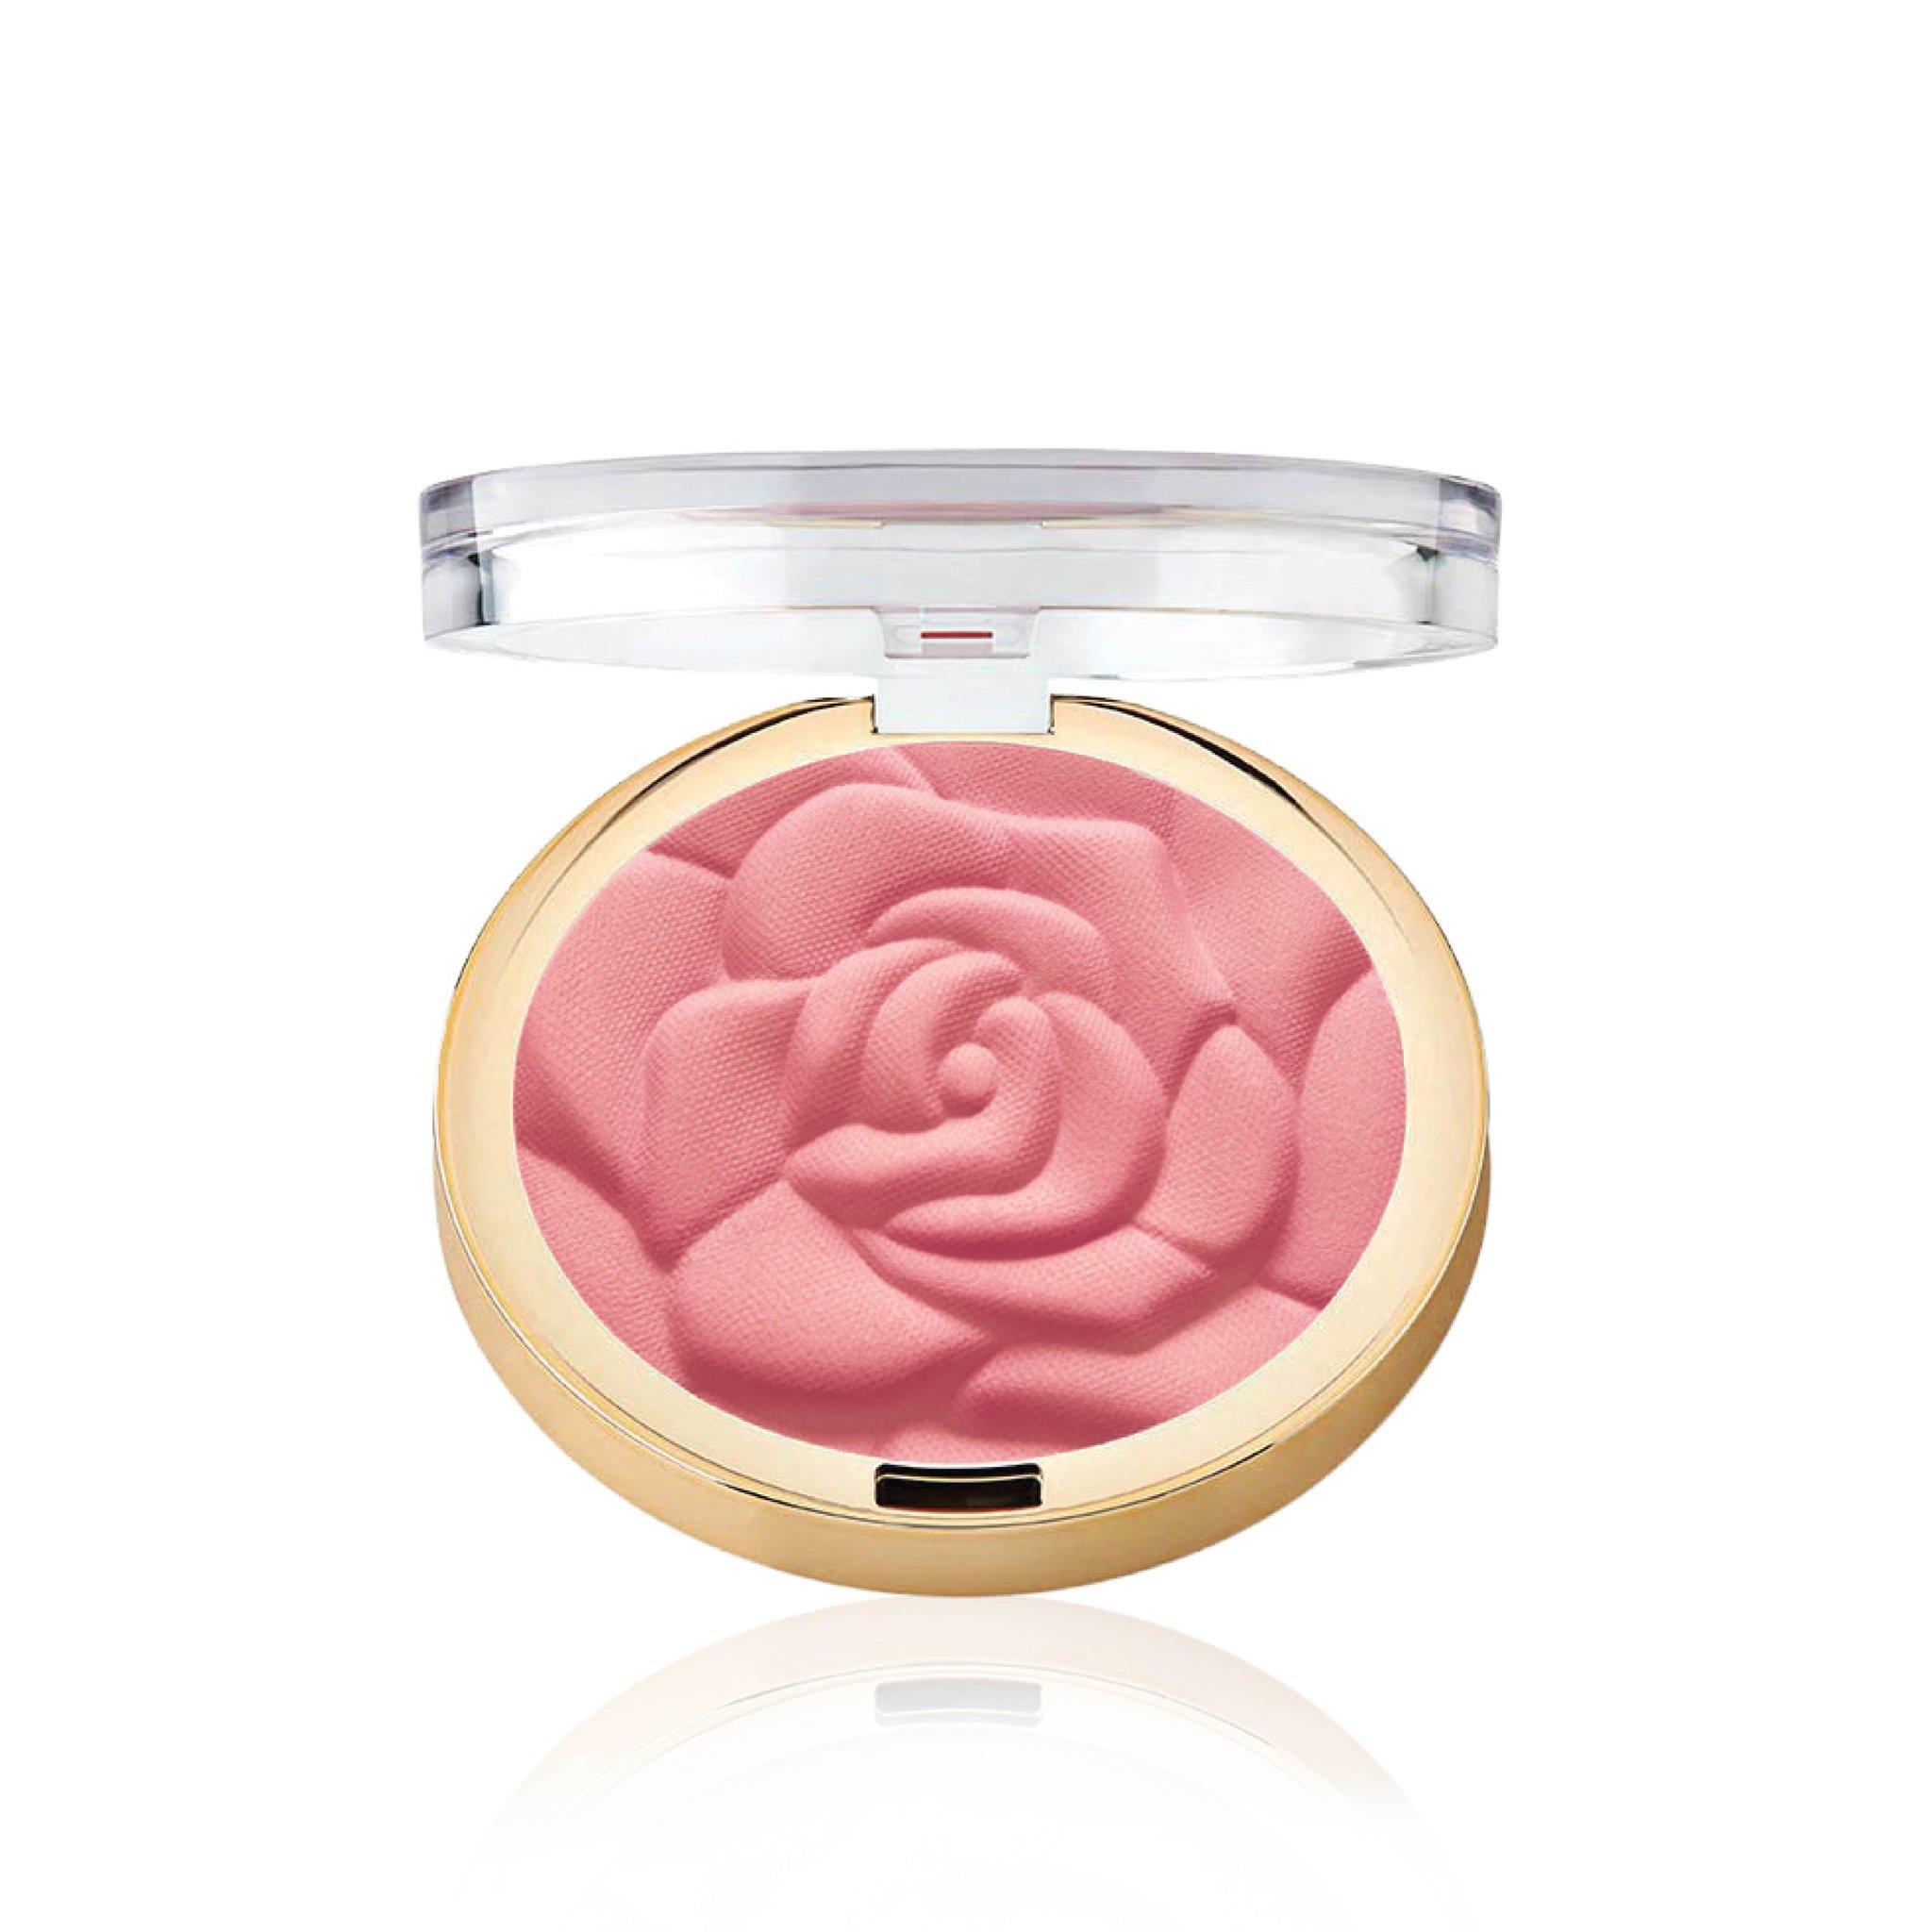 Rose rumenilo Blossom Time